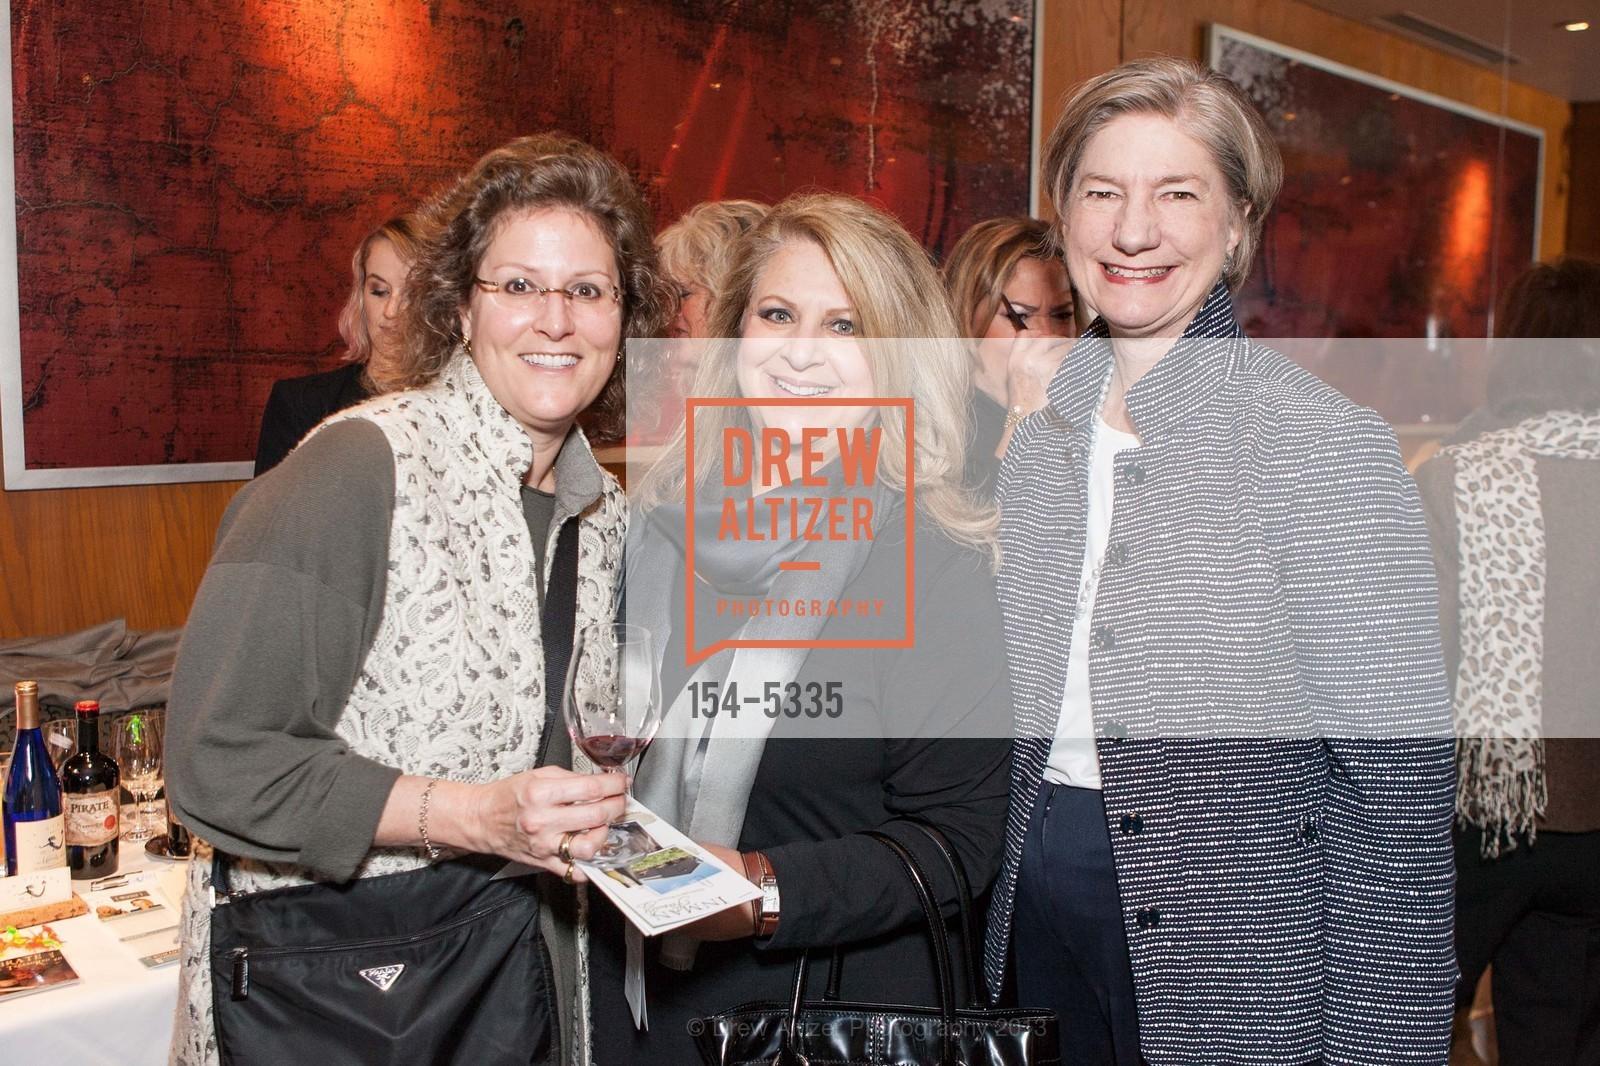 Susan Sangiacomo, Diana Pelliccione, Deborah Ballati, Photo #154-5335